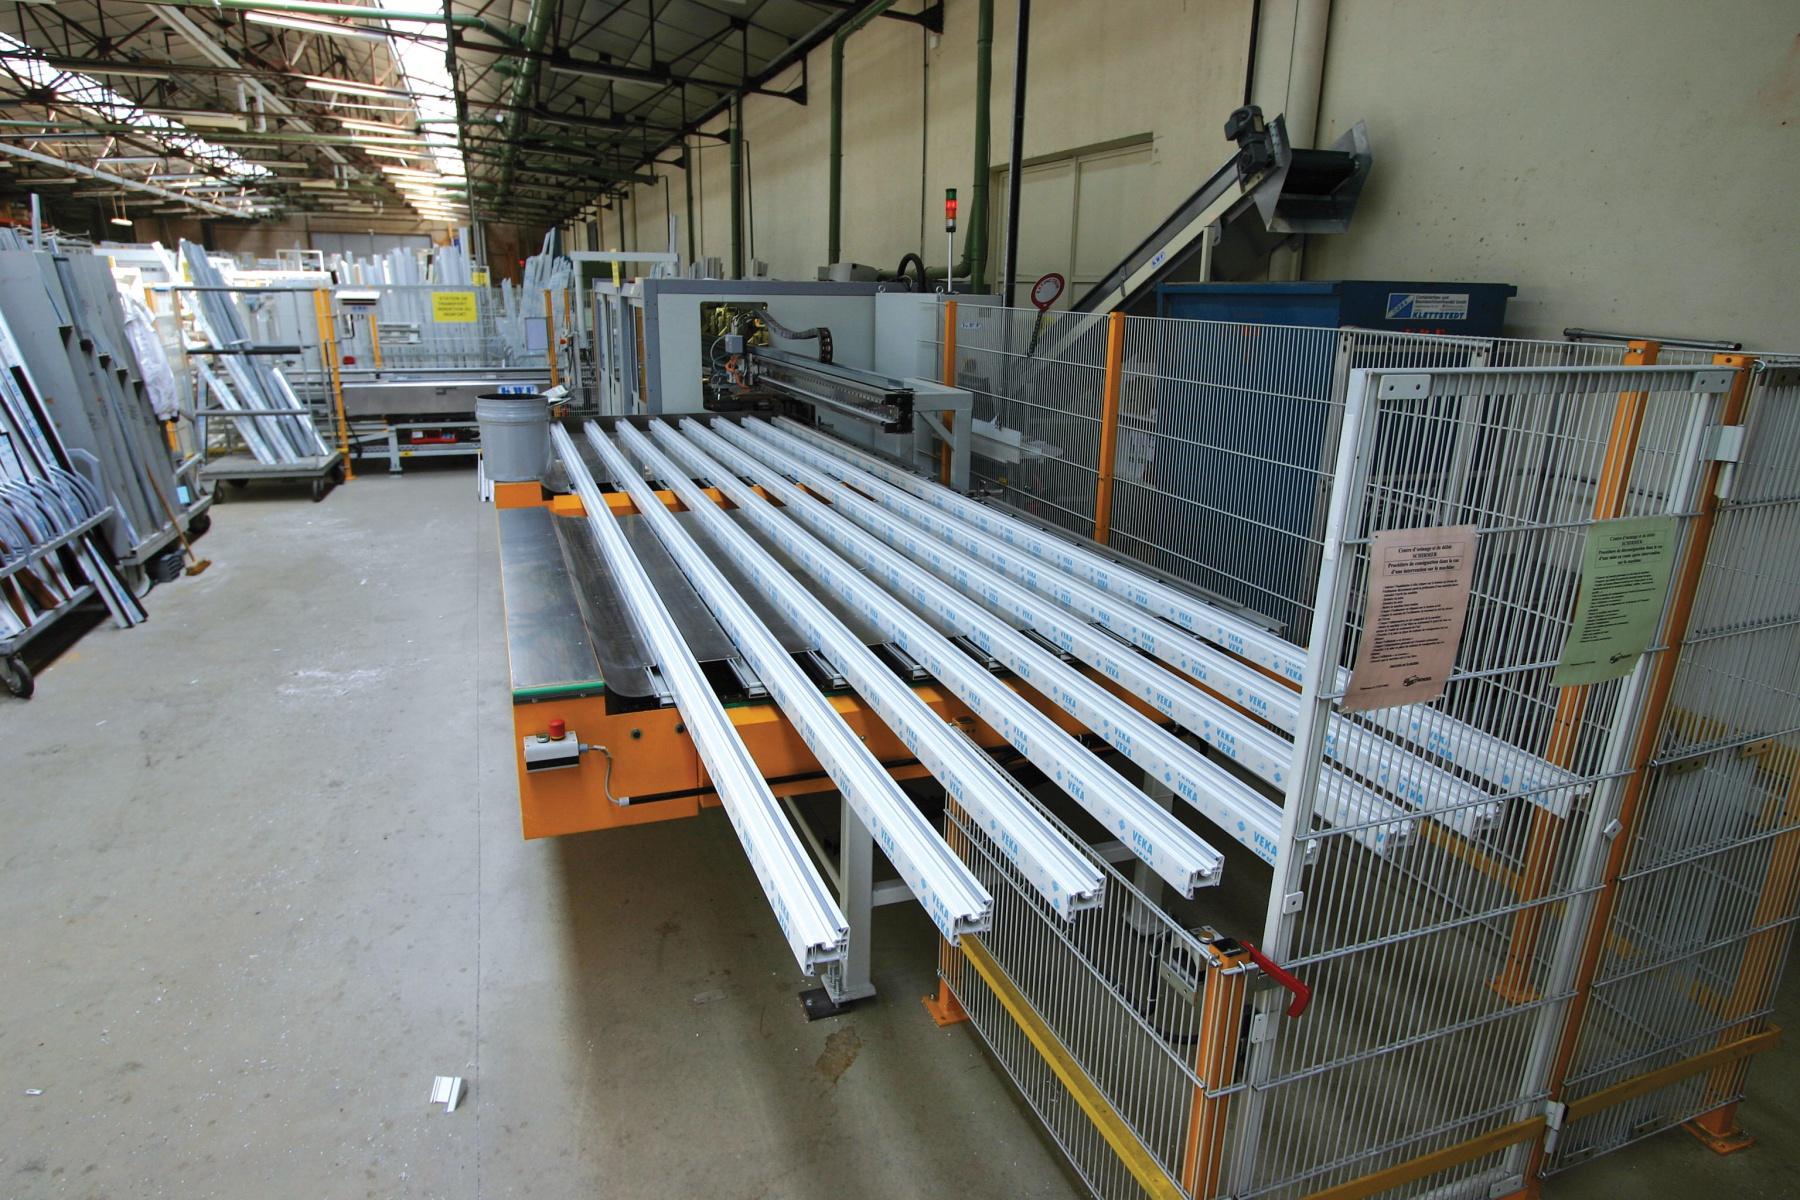 La soci t fabrication trendel fabriquants de for Fabrication fenetre